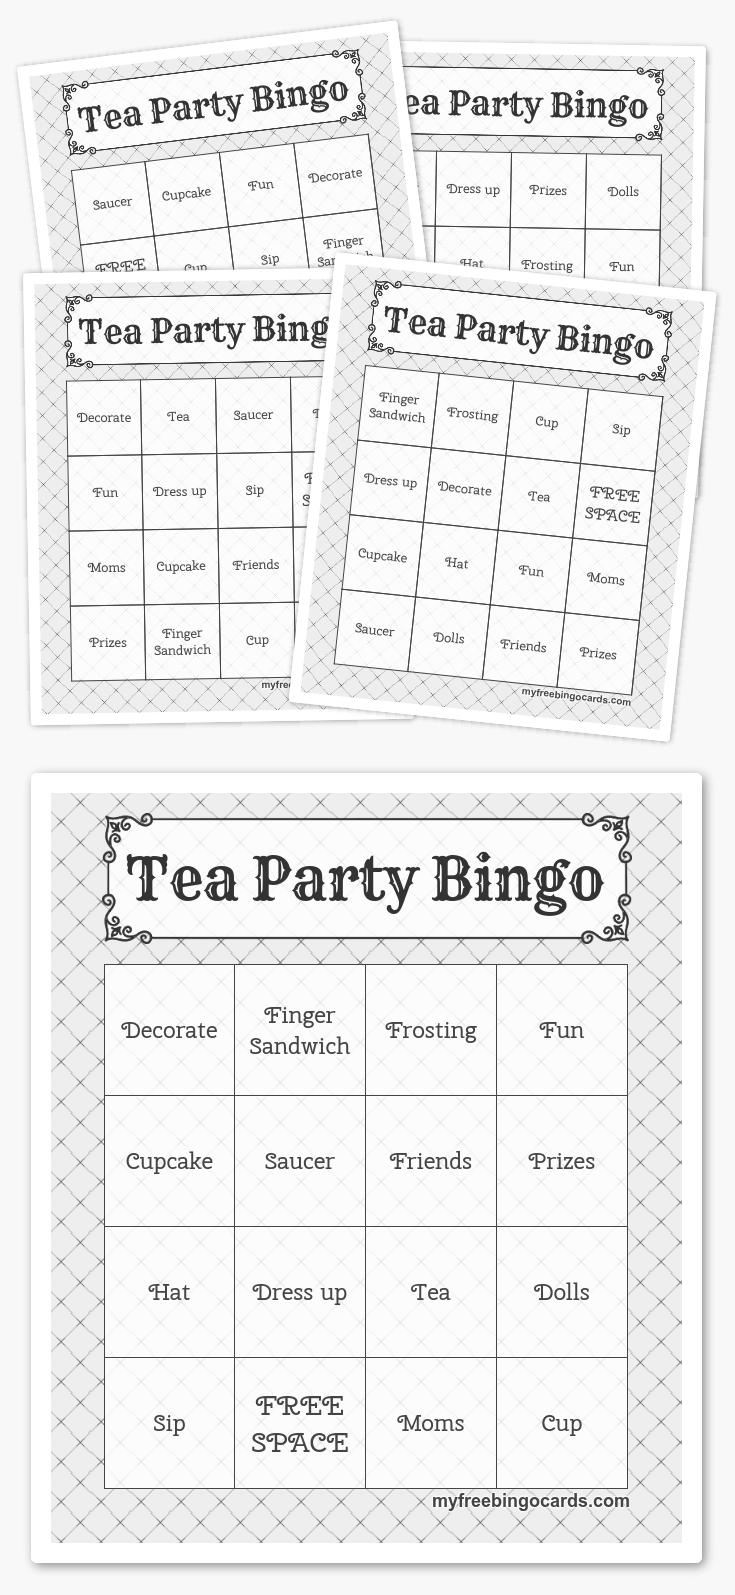 Free Printable Bingo Cards In 2019   Printables   Pinterest   Harry - Free Printable Tea Party Games